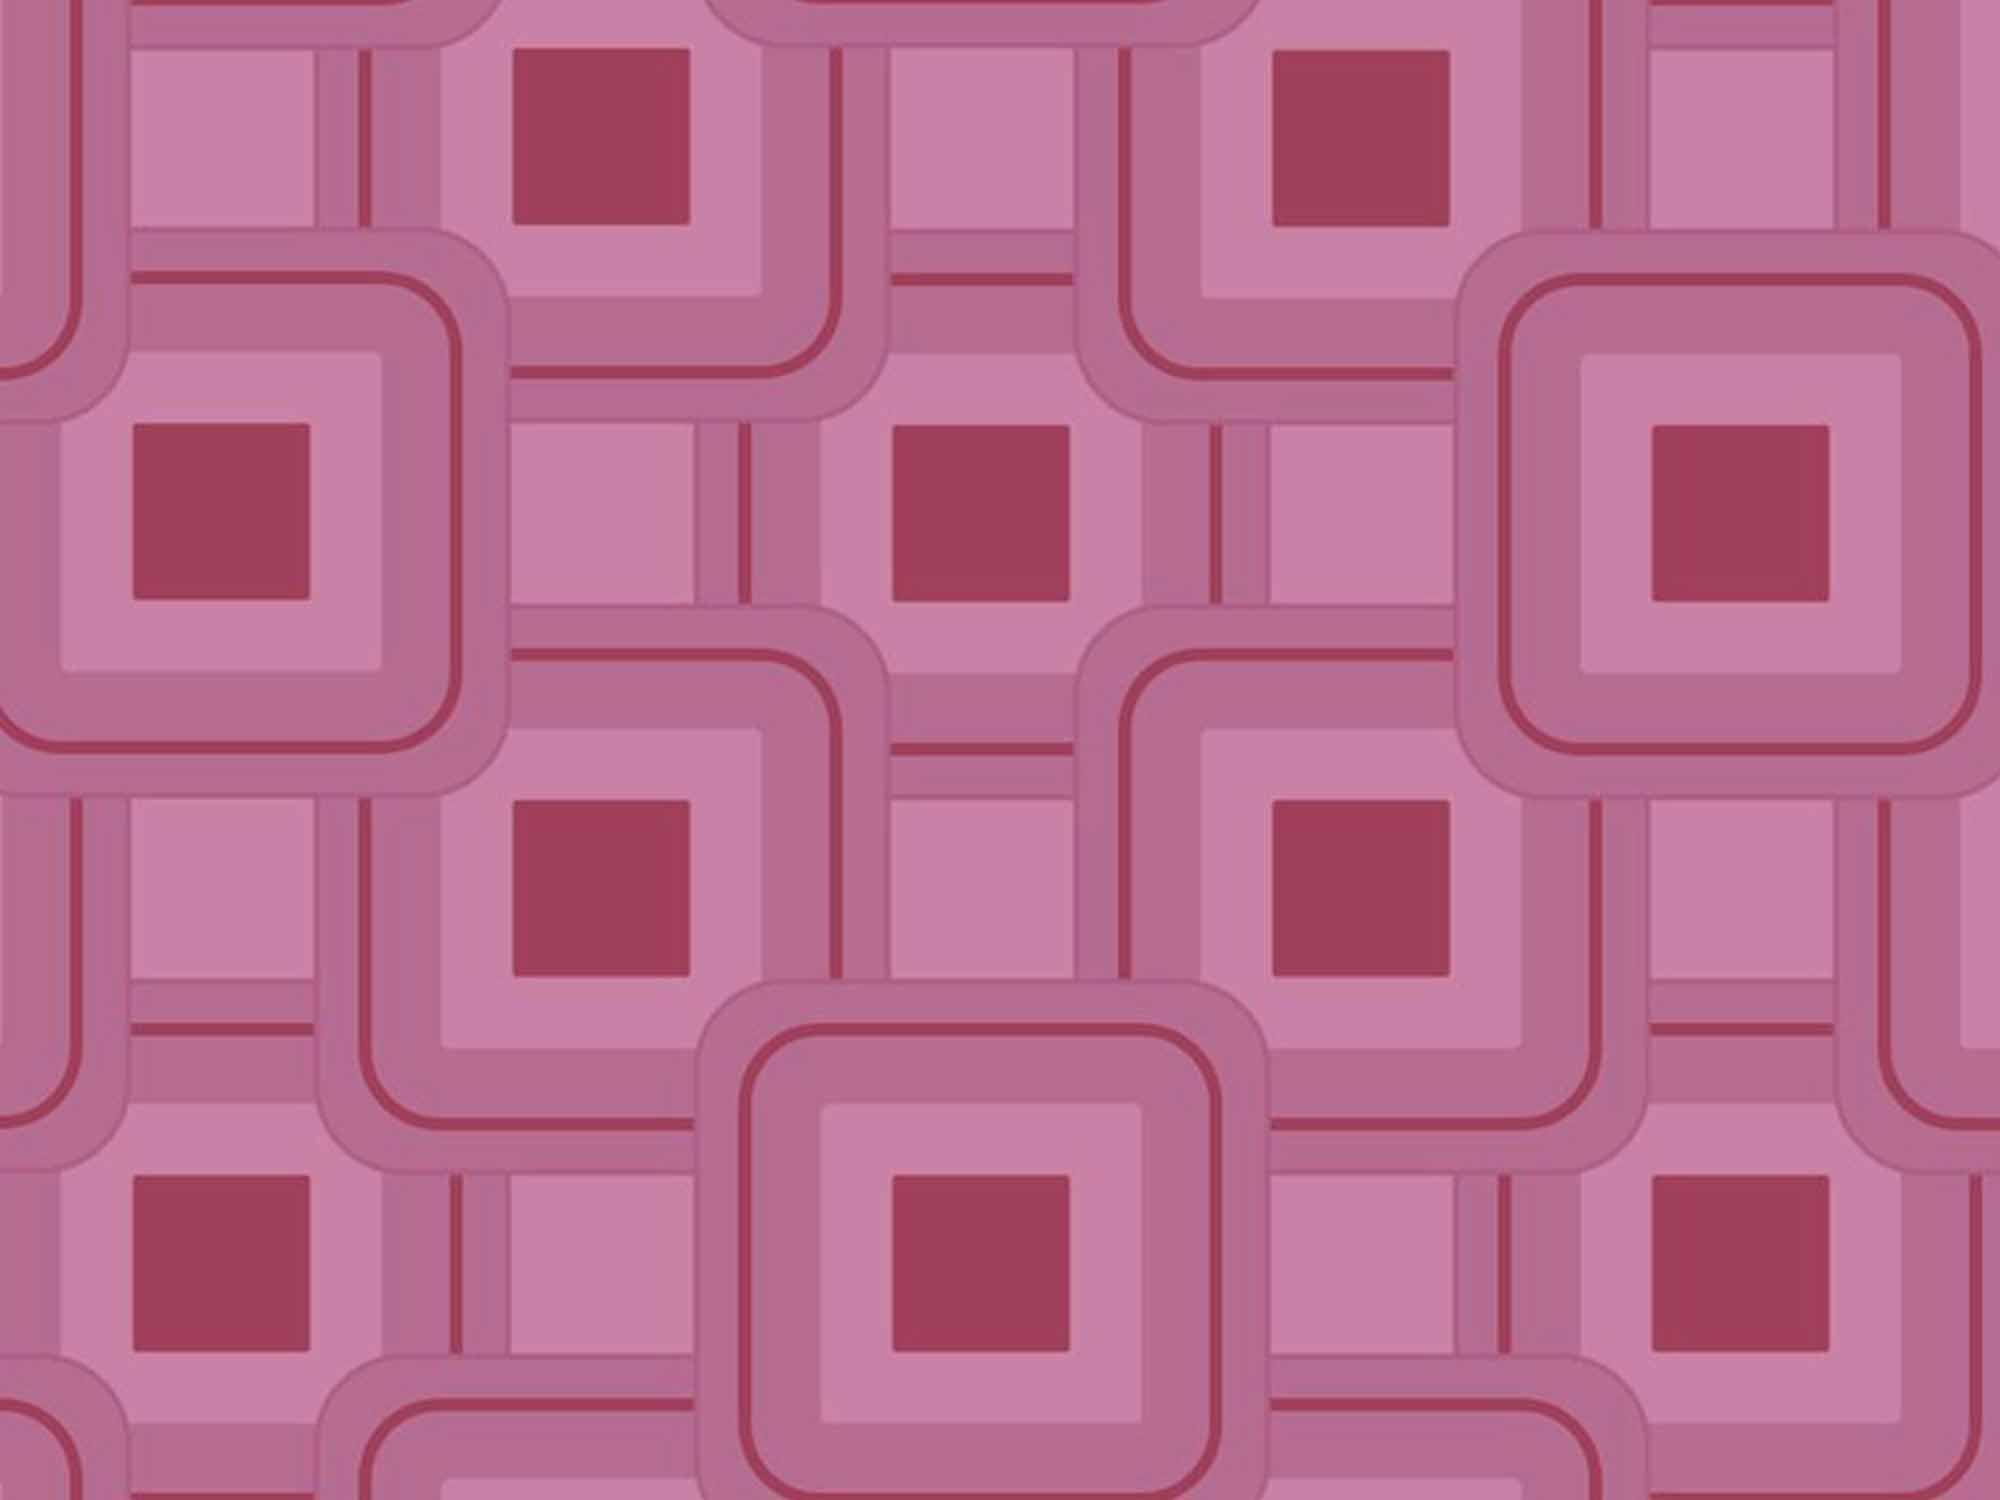 Papel de Parede para Sala Geométrico 0092 - Adesivos de Parede  - Paredes Decoradas